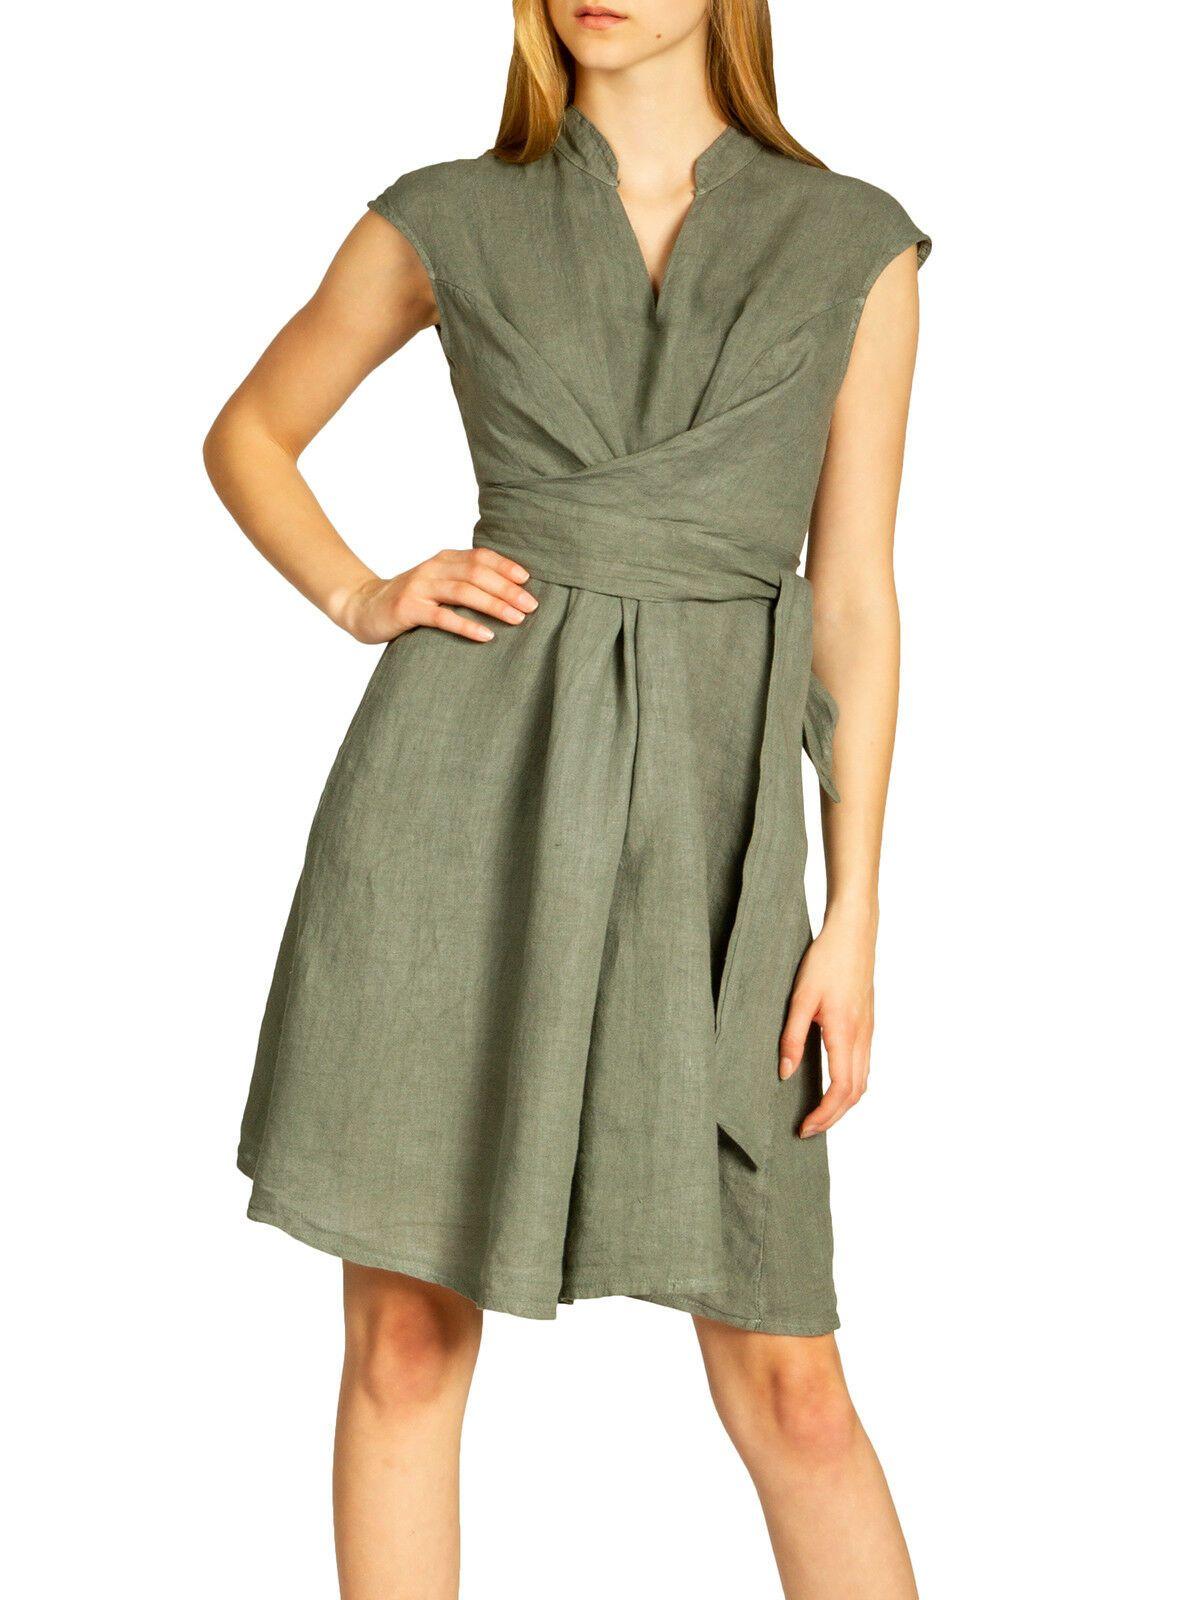 casar skl016 damen sommer kleid leinenkleid knielang elegant